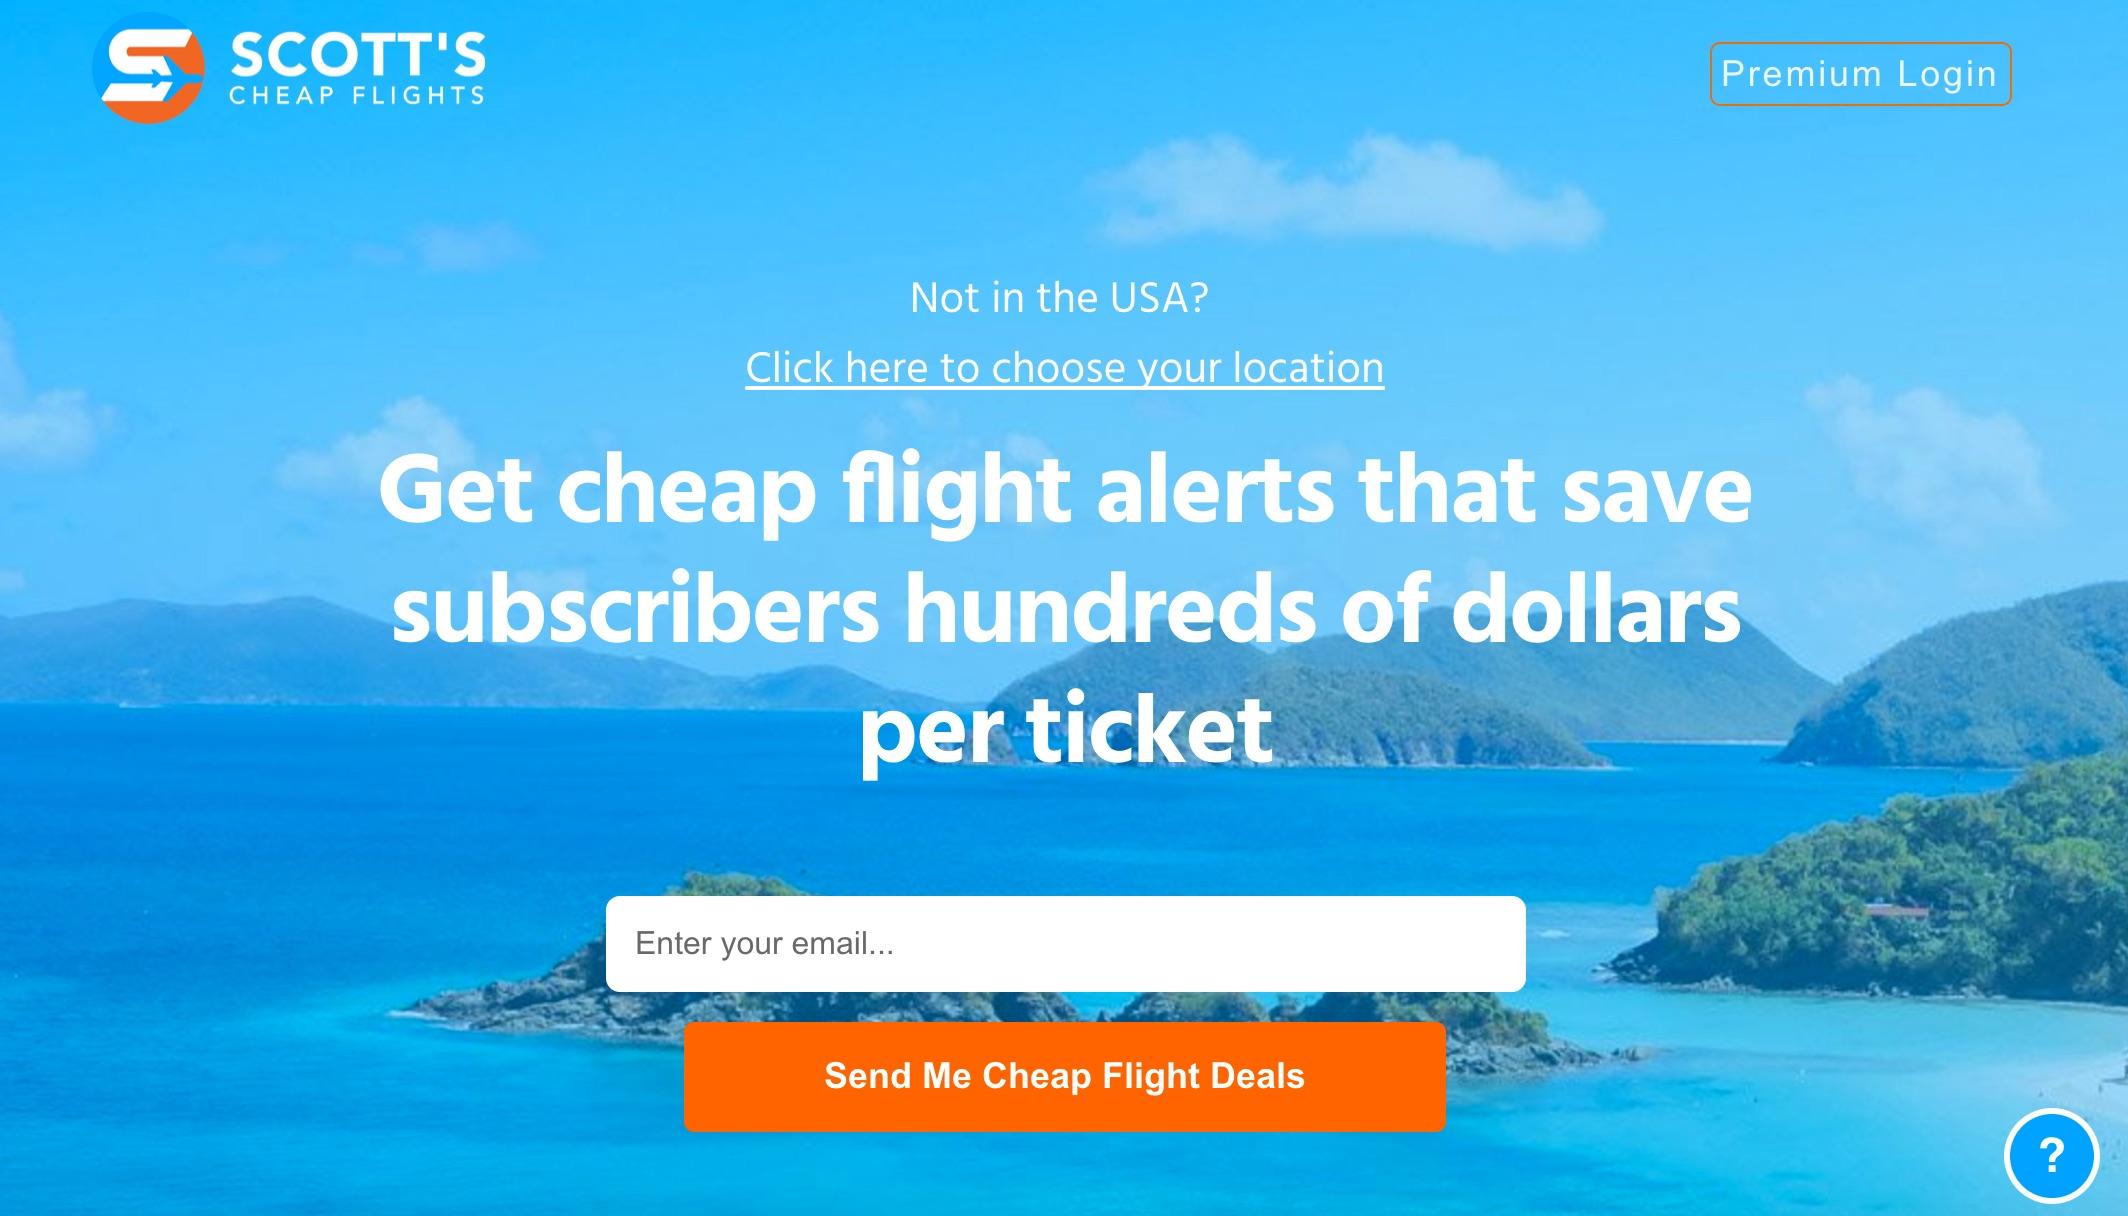 New Tricks To Hacking Airfares